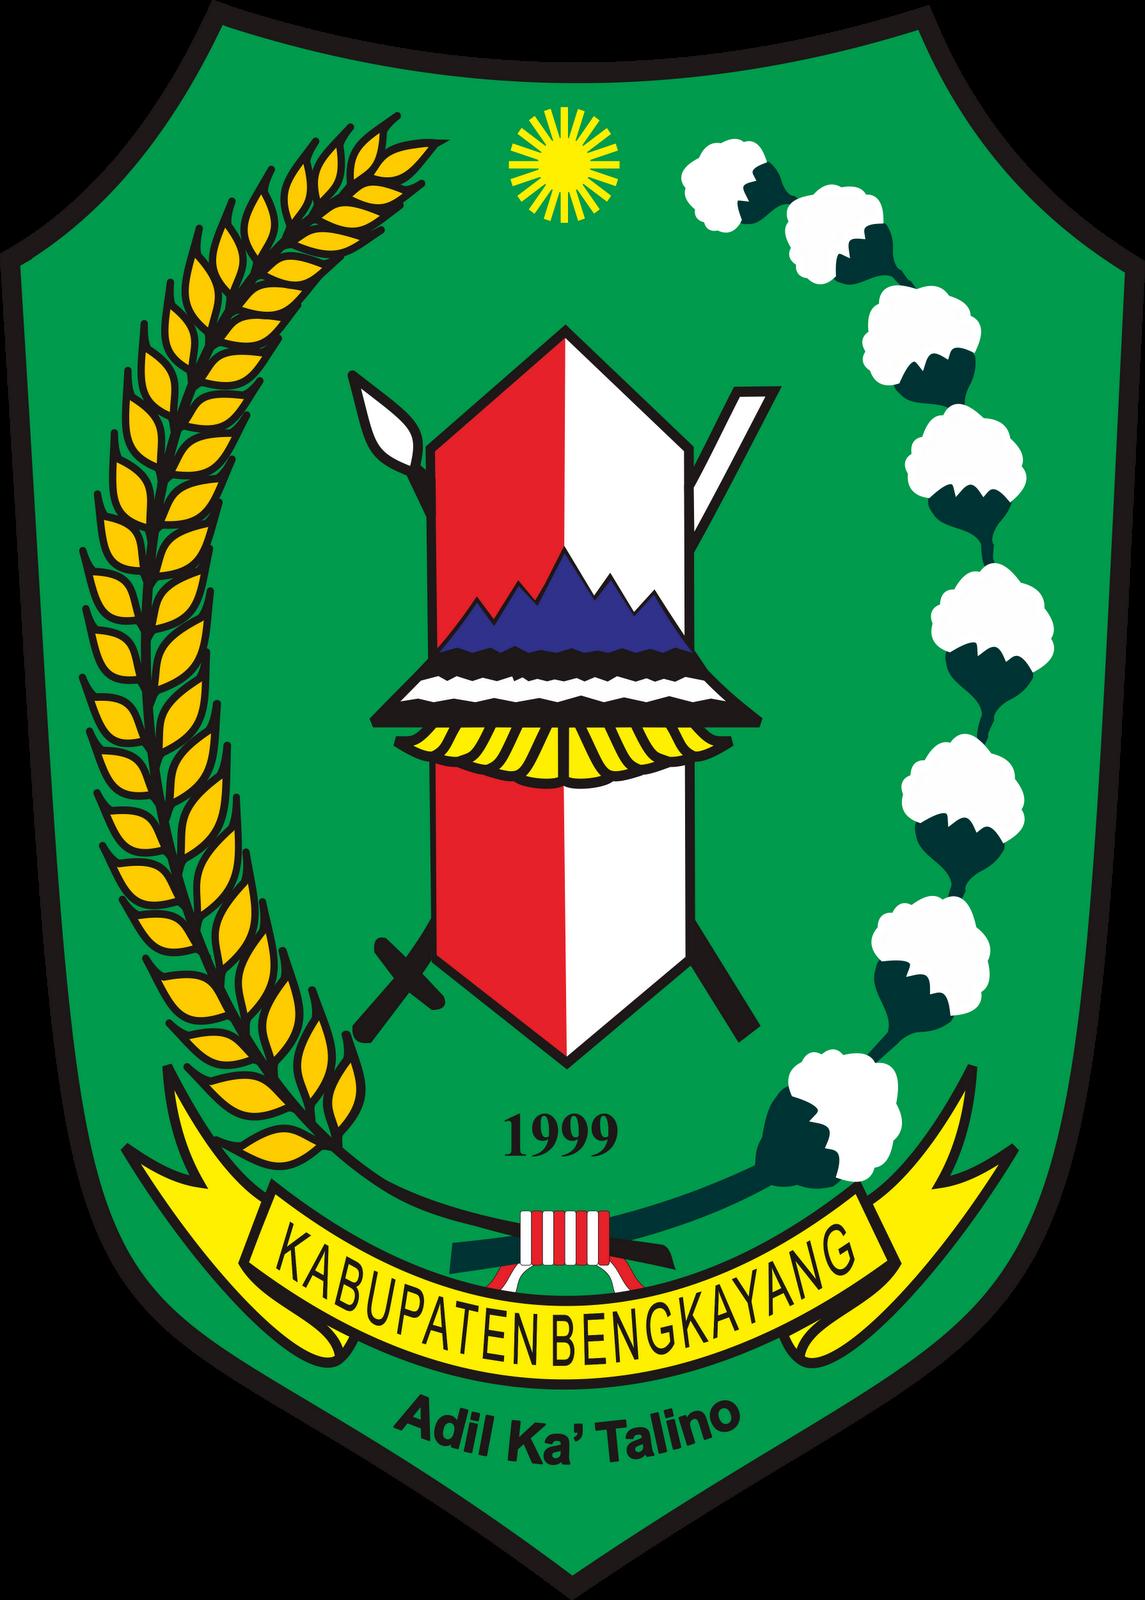 Kabupaten Bengkayang Wikipedia Bahasa Indonesia Ensiklopedia Bebas